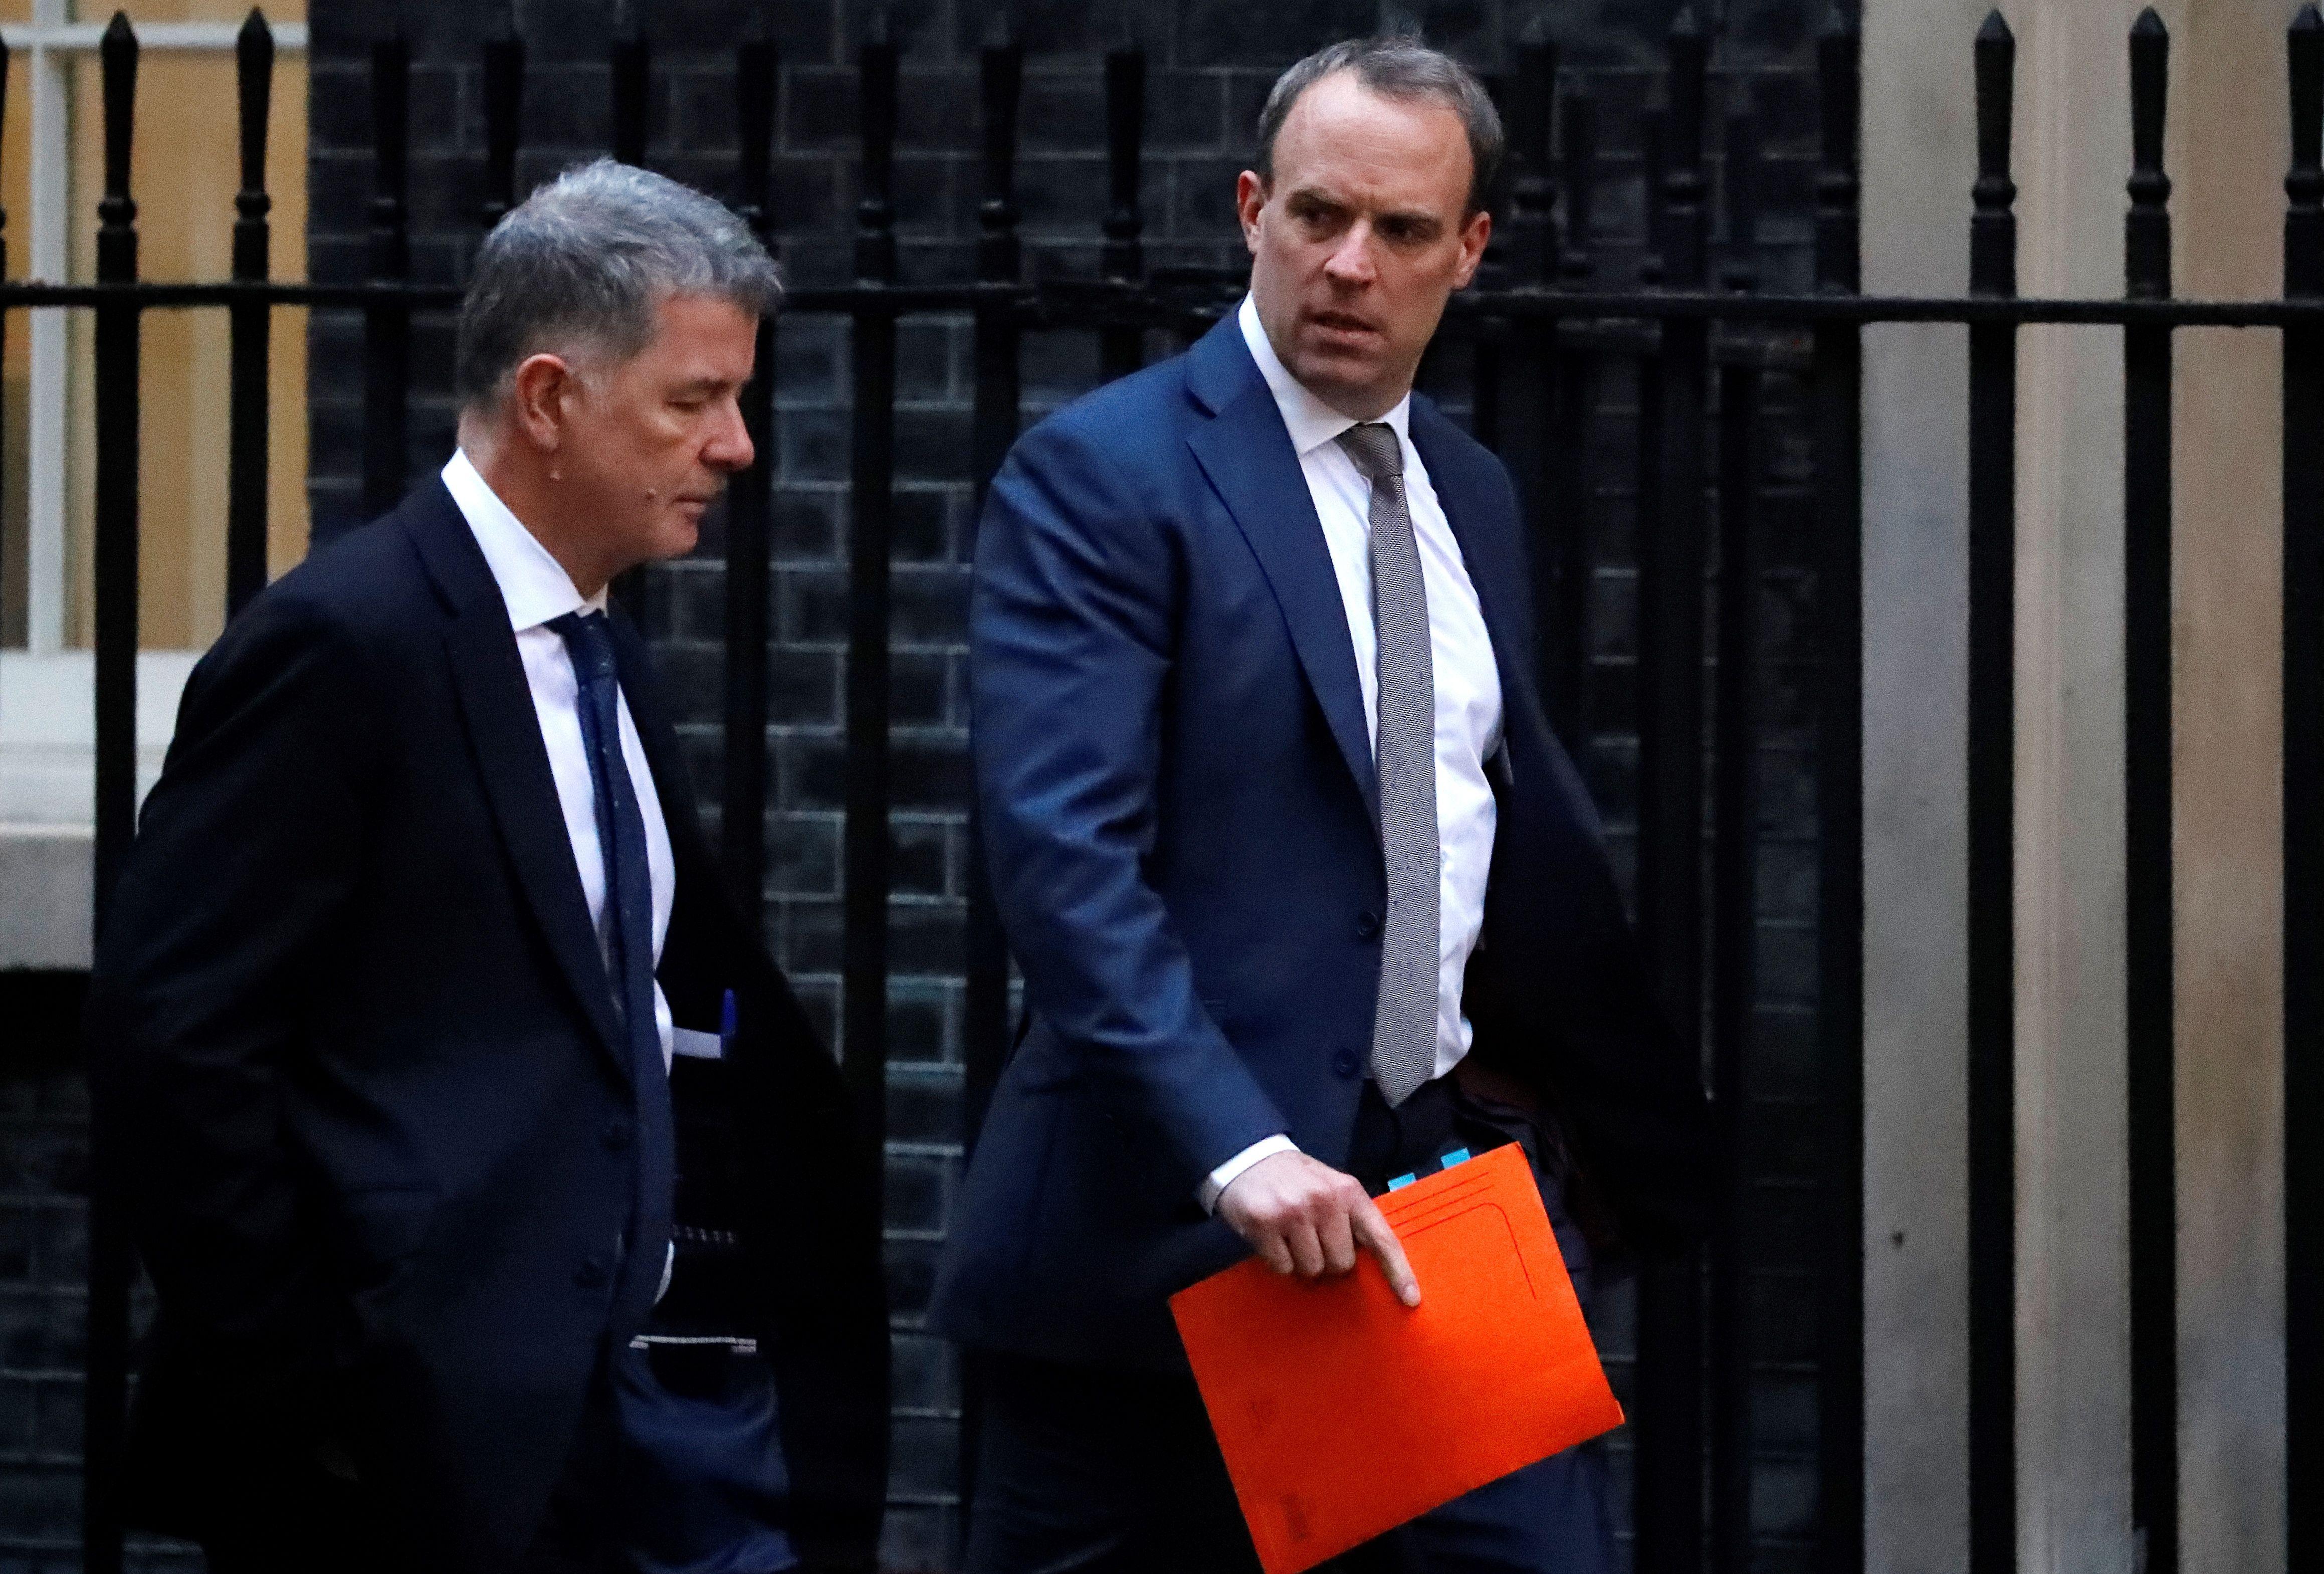 UK Foreign Secretary Dominic Raab (R) walks towards 10 Downing Street on January 6, 2020.